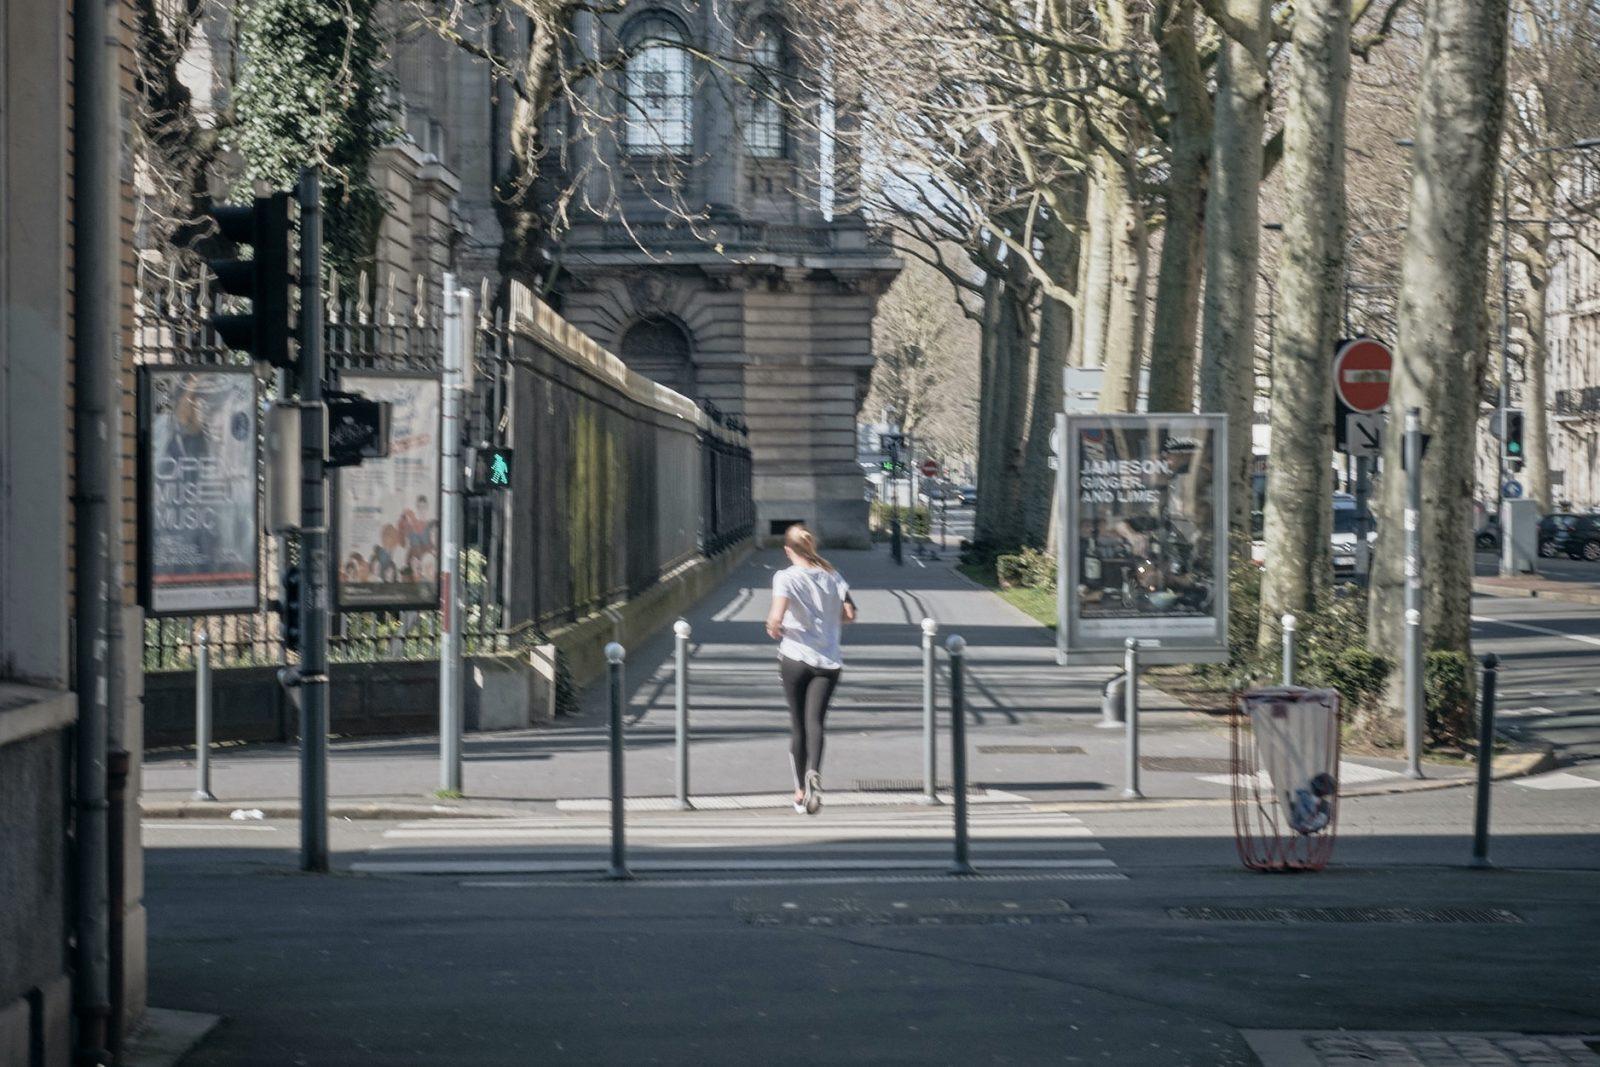 une joggueuse pendant le coronavirus, Lille © Quentin saison / Collectif Gerda